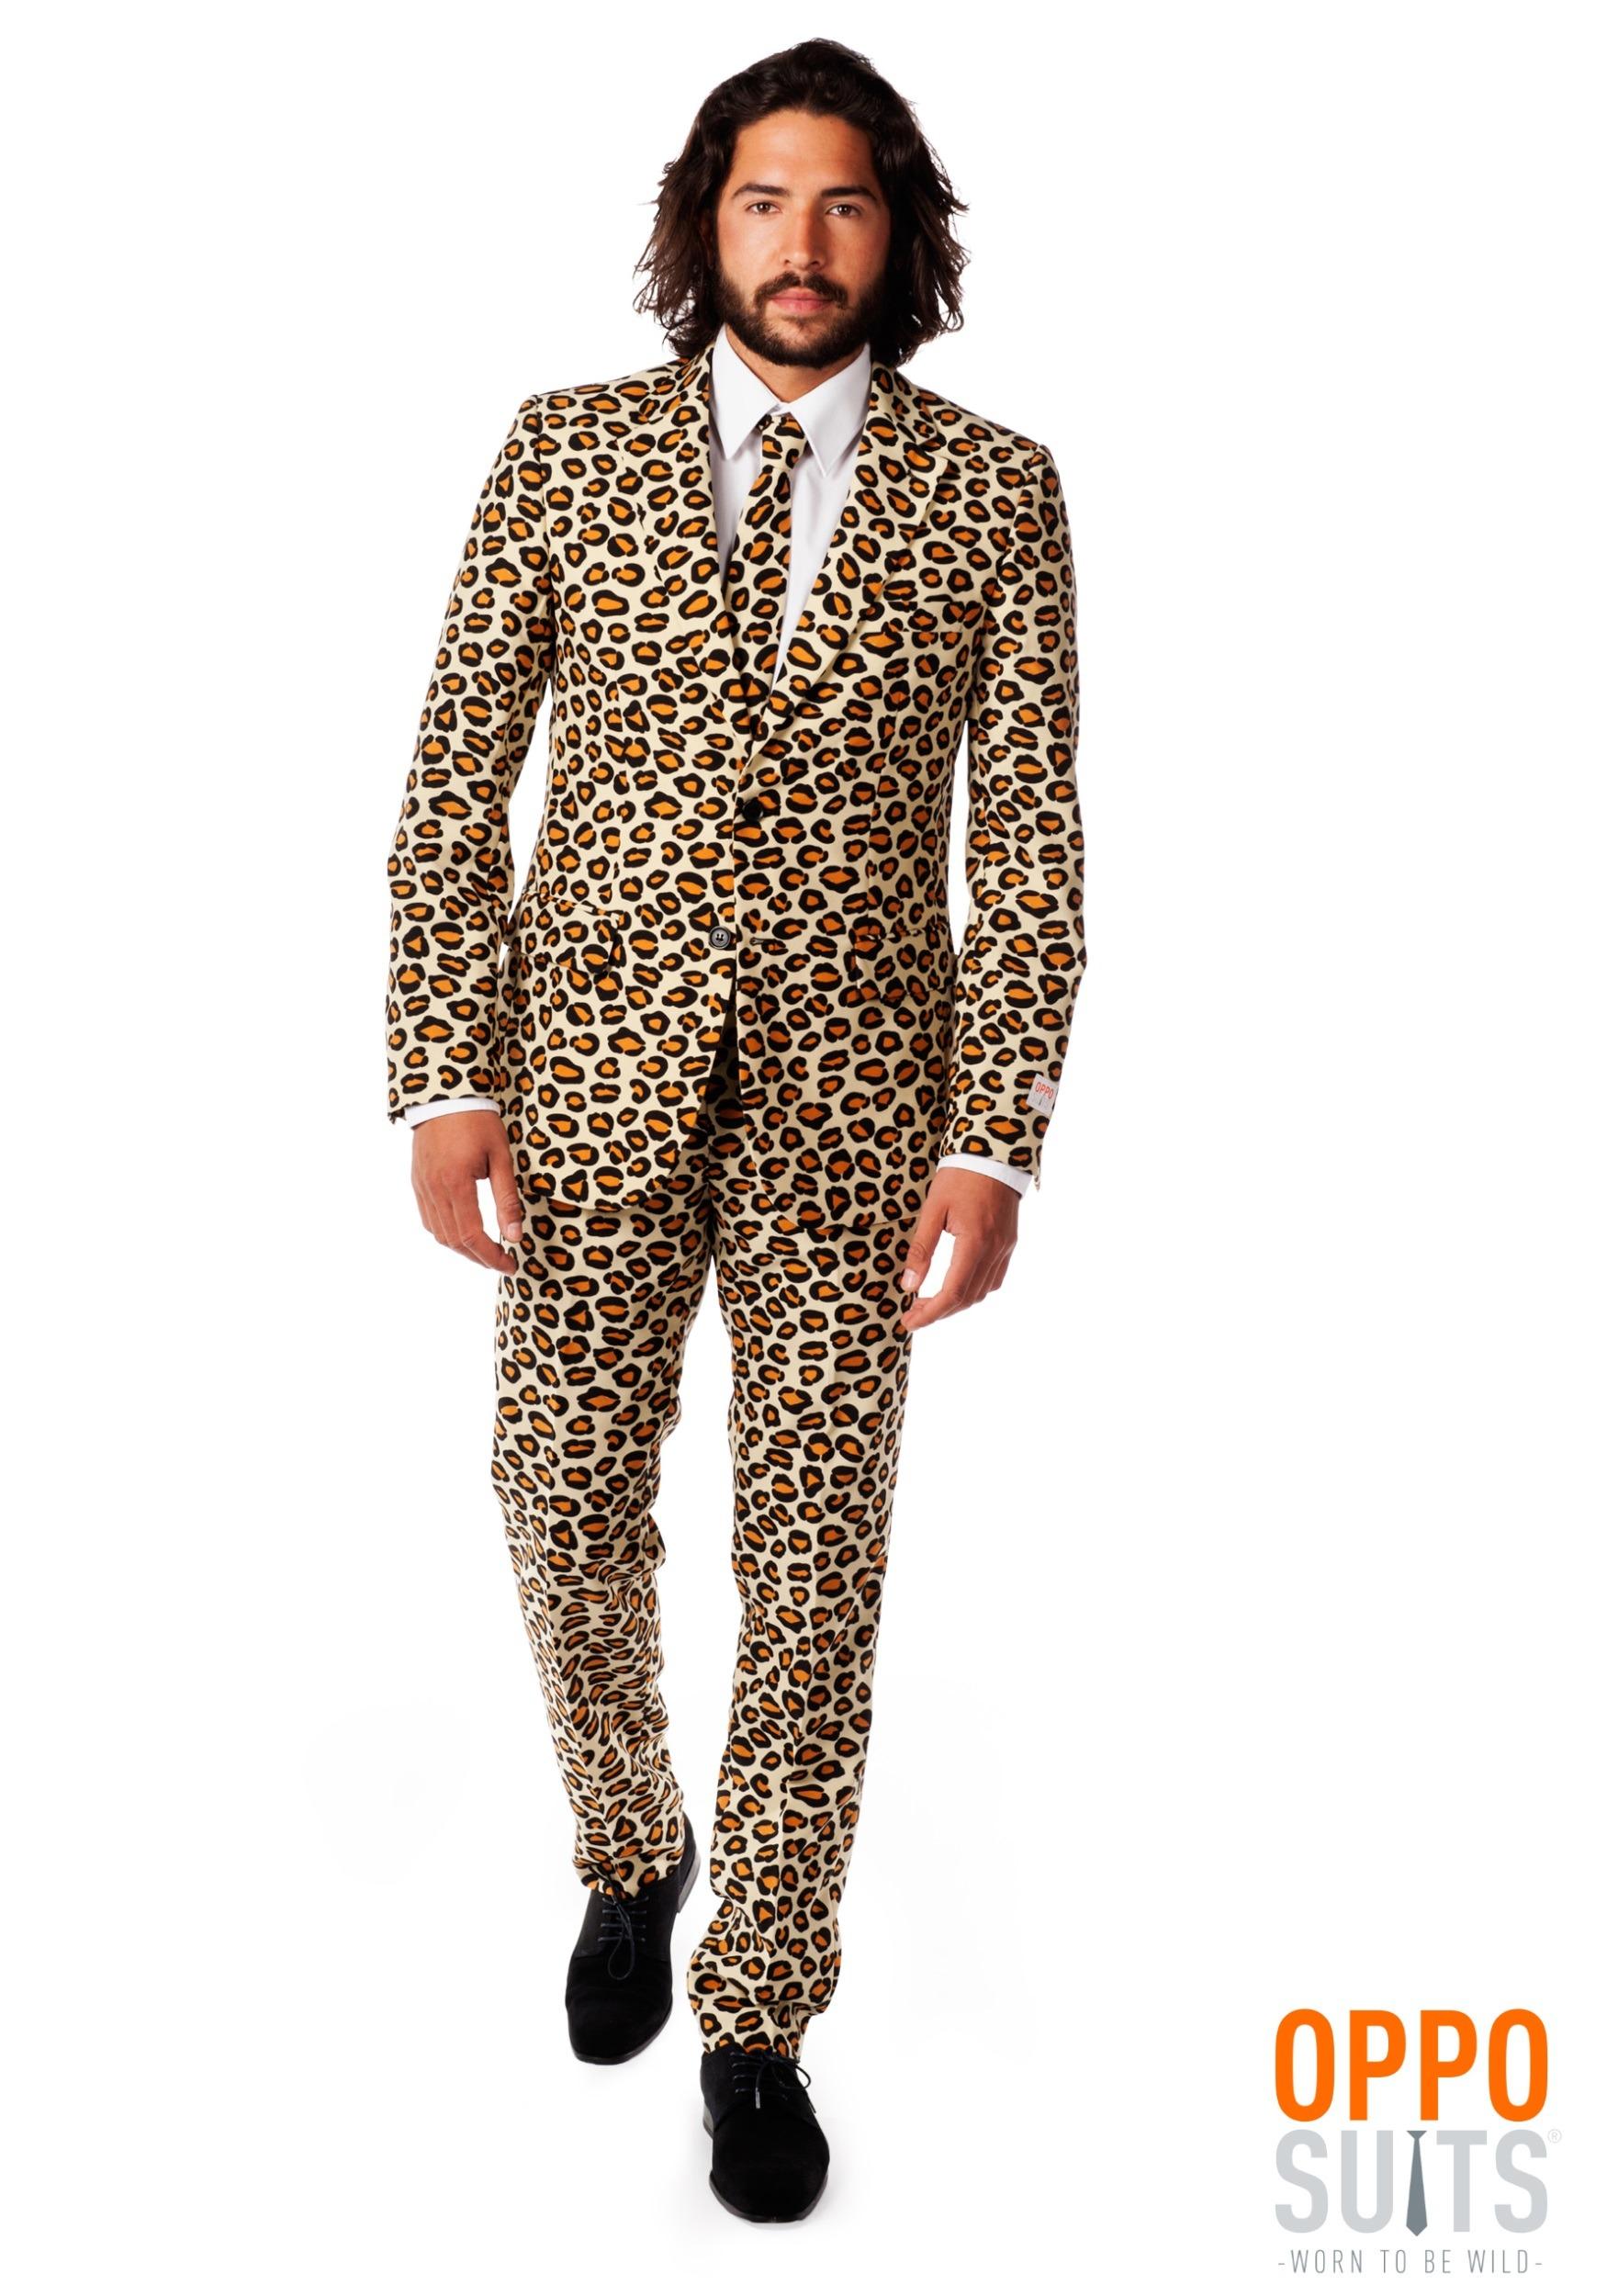 Mens Jaguar Animal Printed Suit  sc 1 st  Halloween Costumes & Menu0027s OppoSuits Jaguar Print Suit